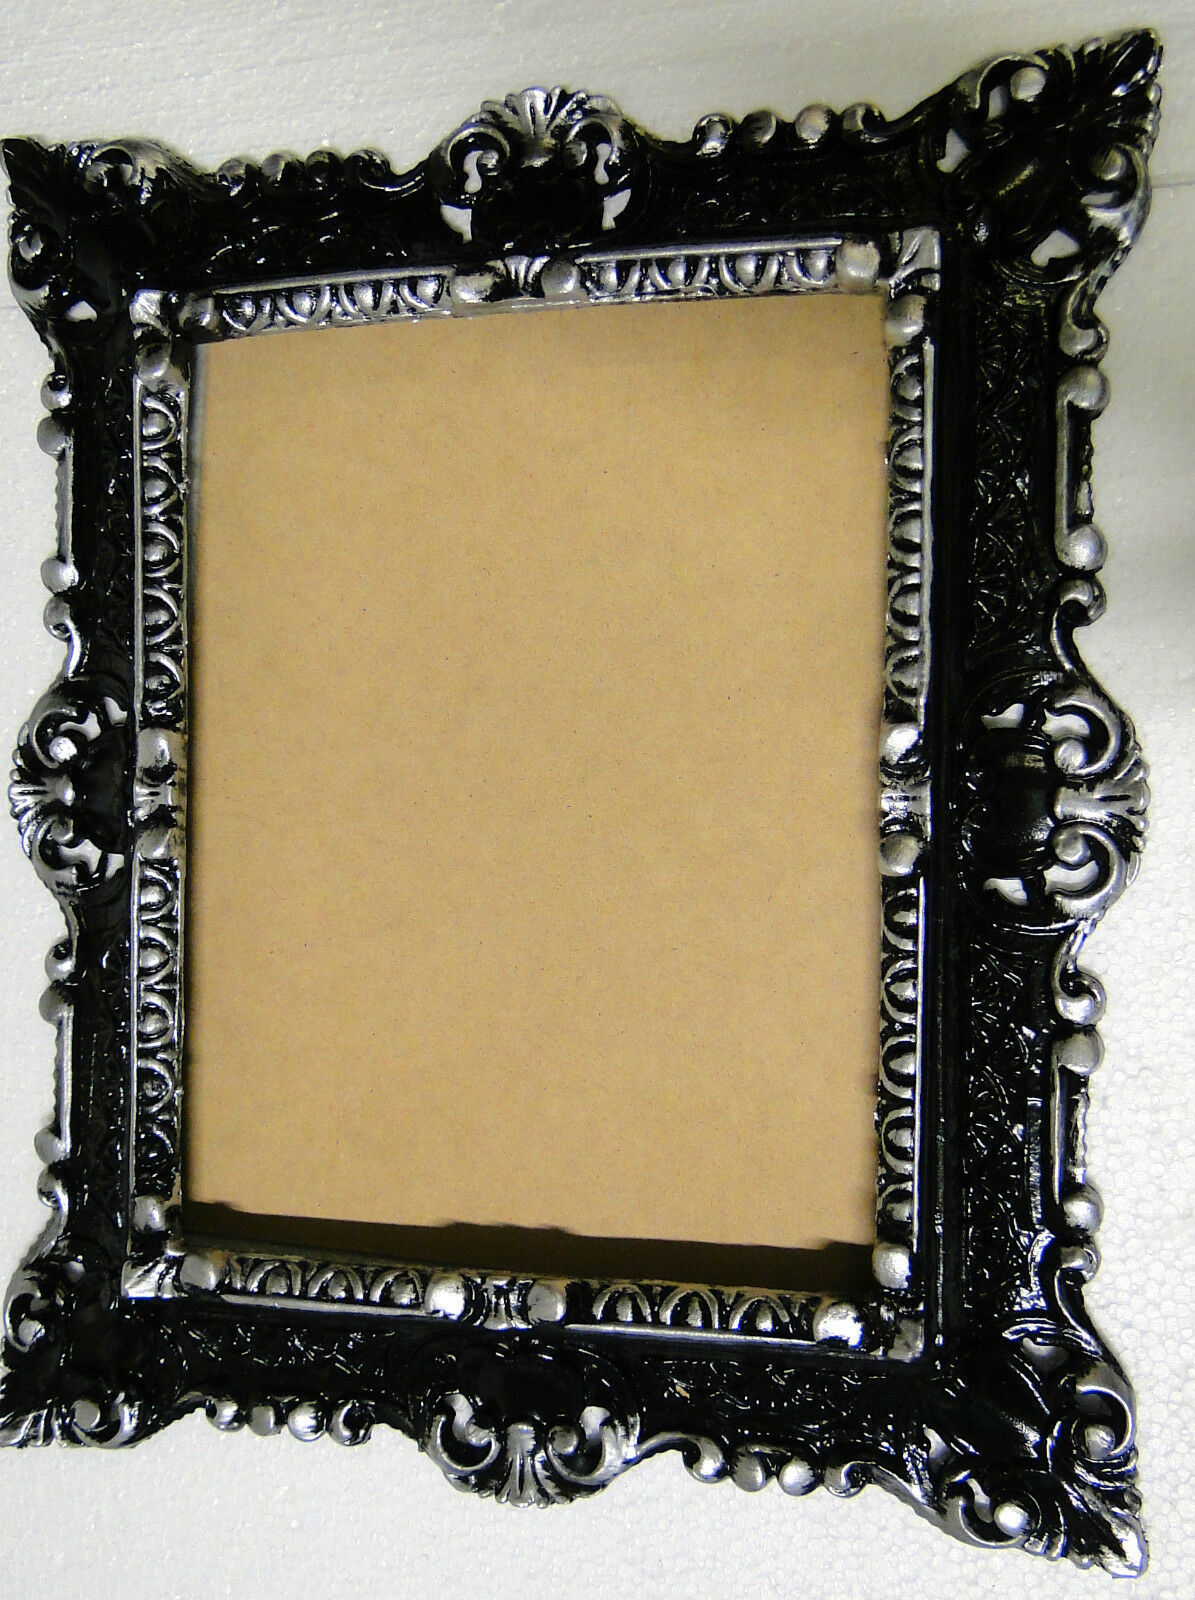 bilderrahmen mit glas 45x 37fotorahmen schwarz-silber antik barock